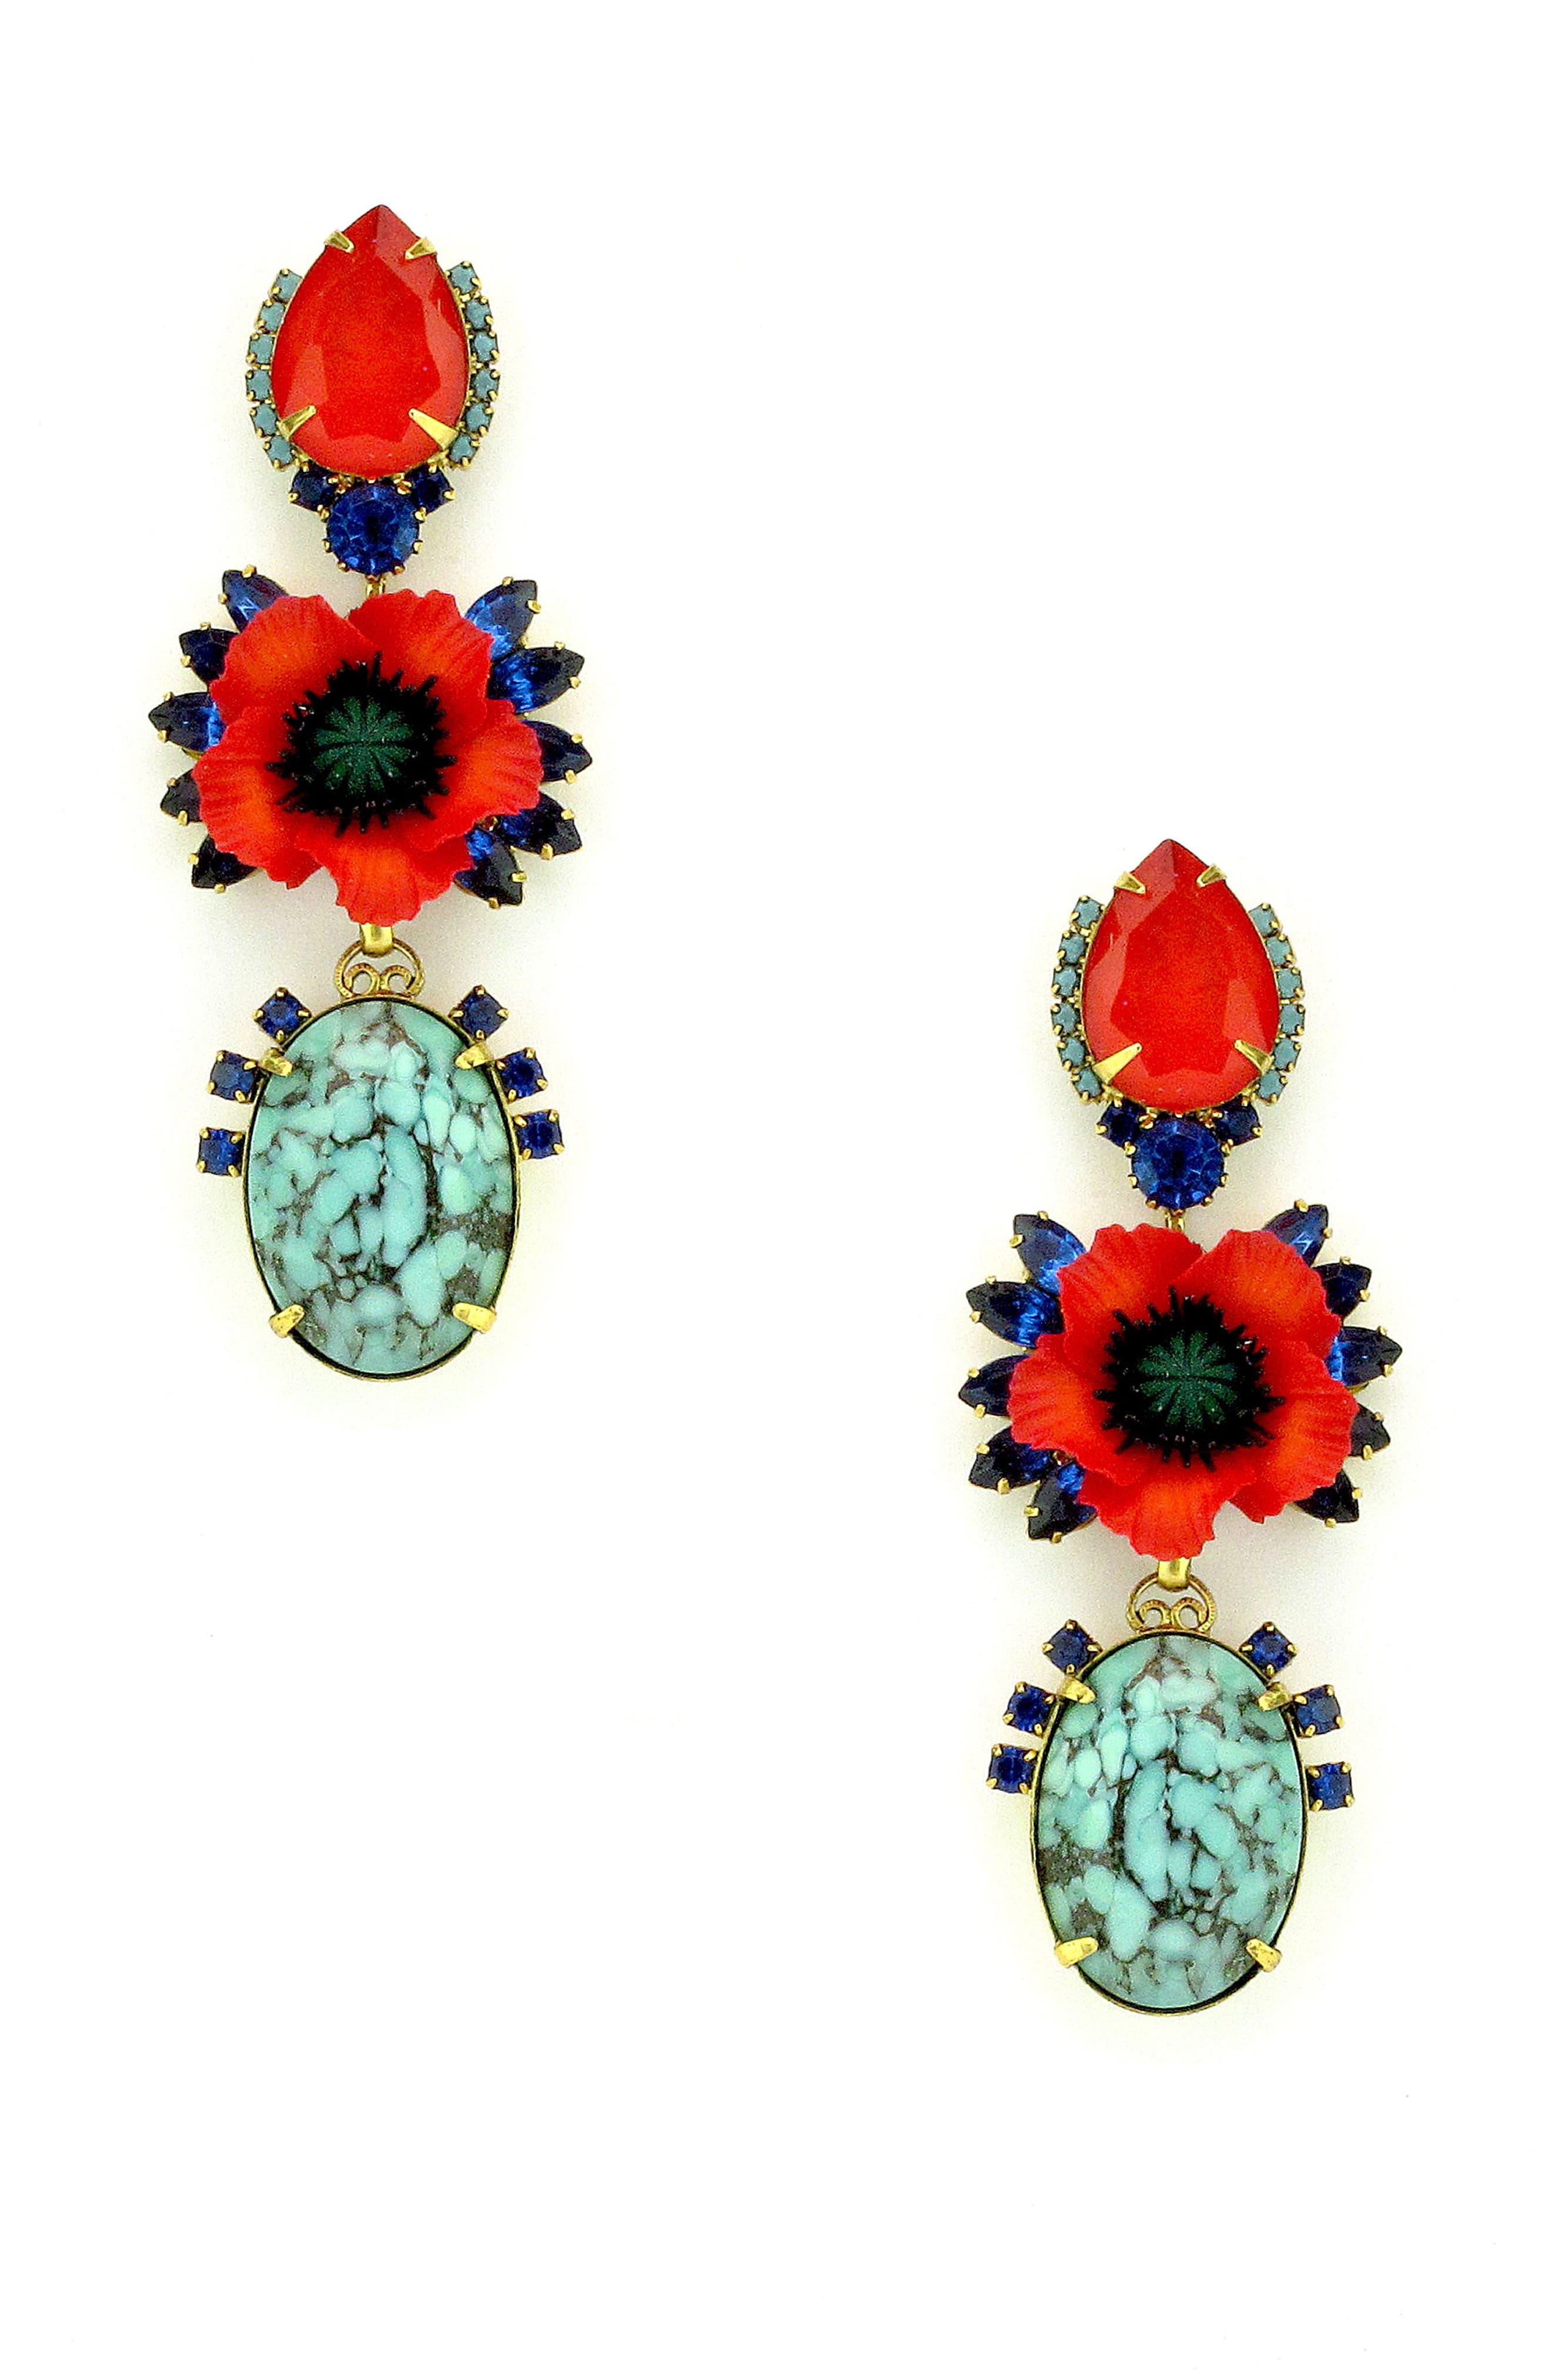 Zula Crystal Drop Earrings,                             Main thumbnail 1, color,                             600